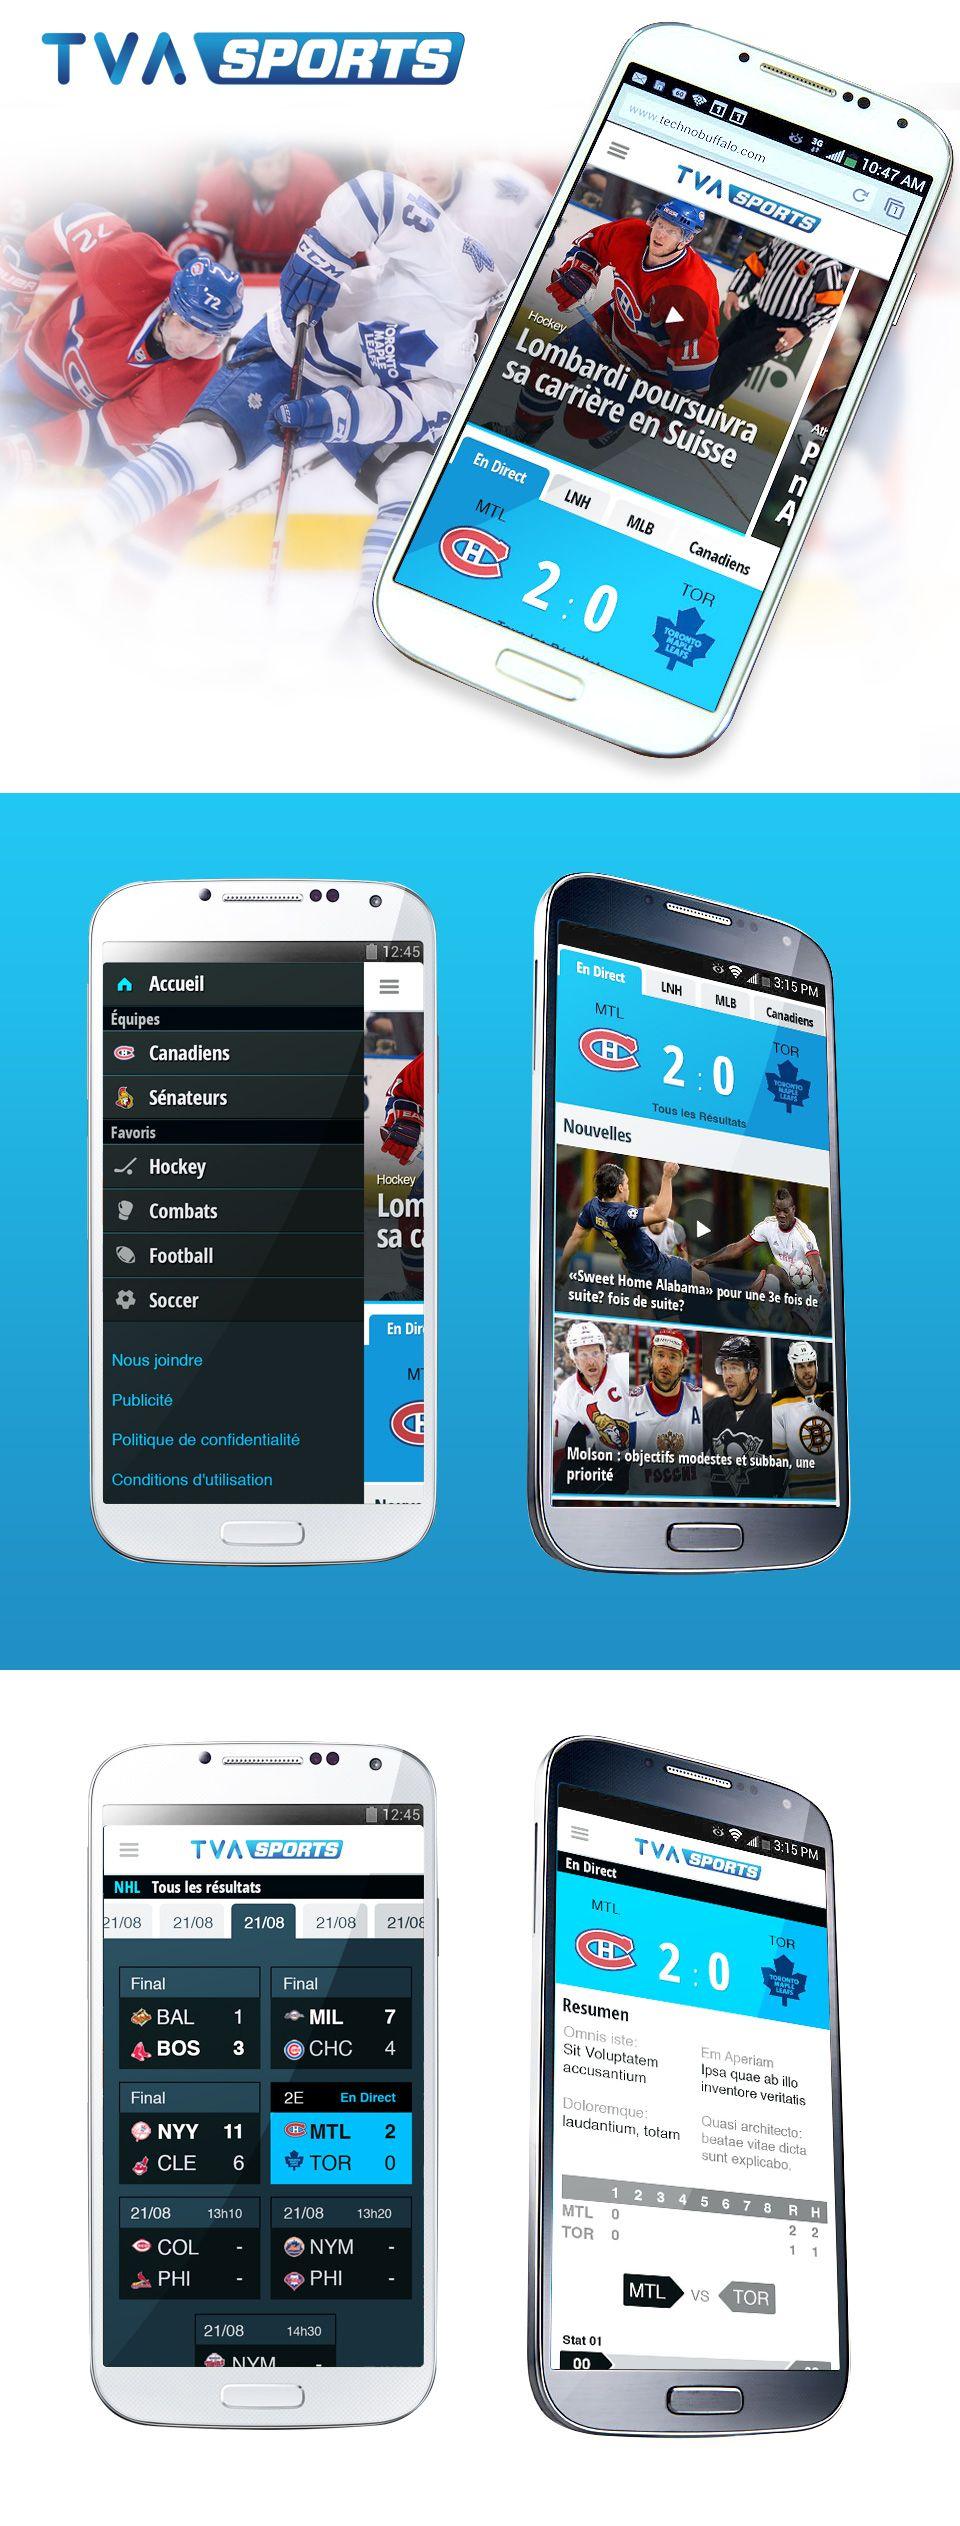 TVA Sports Site Mobile Sports sites, Sports, Mobile